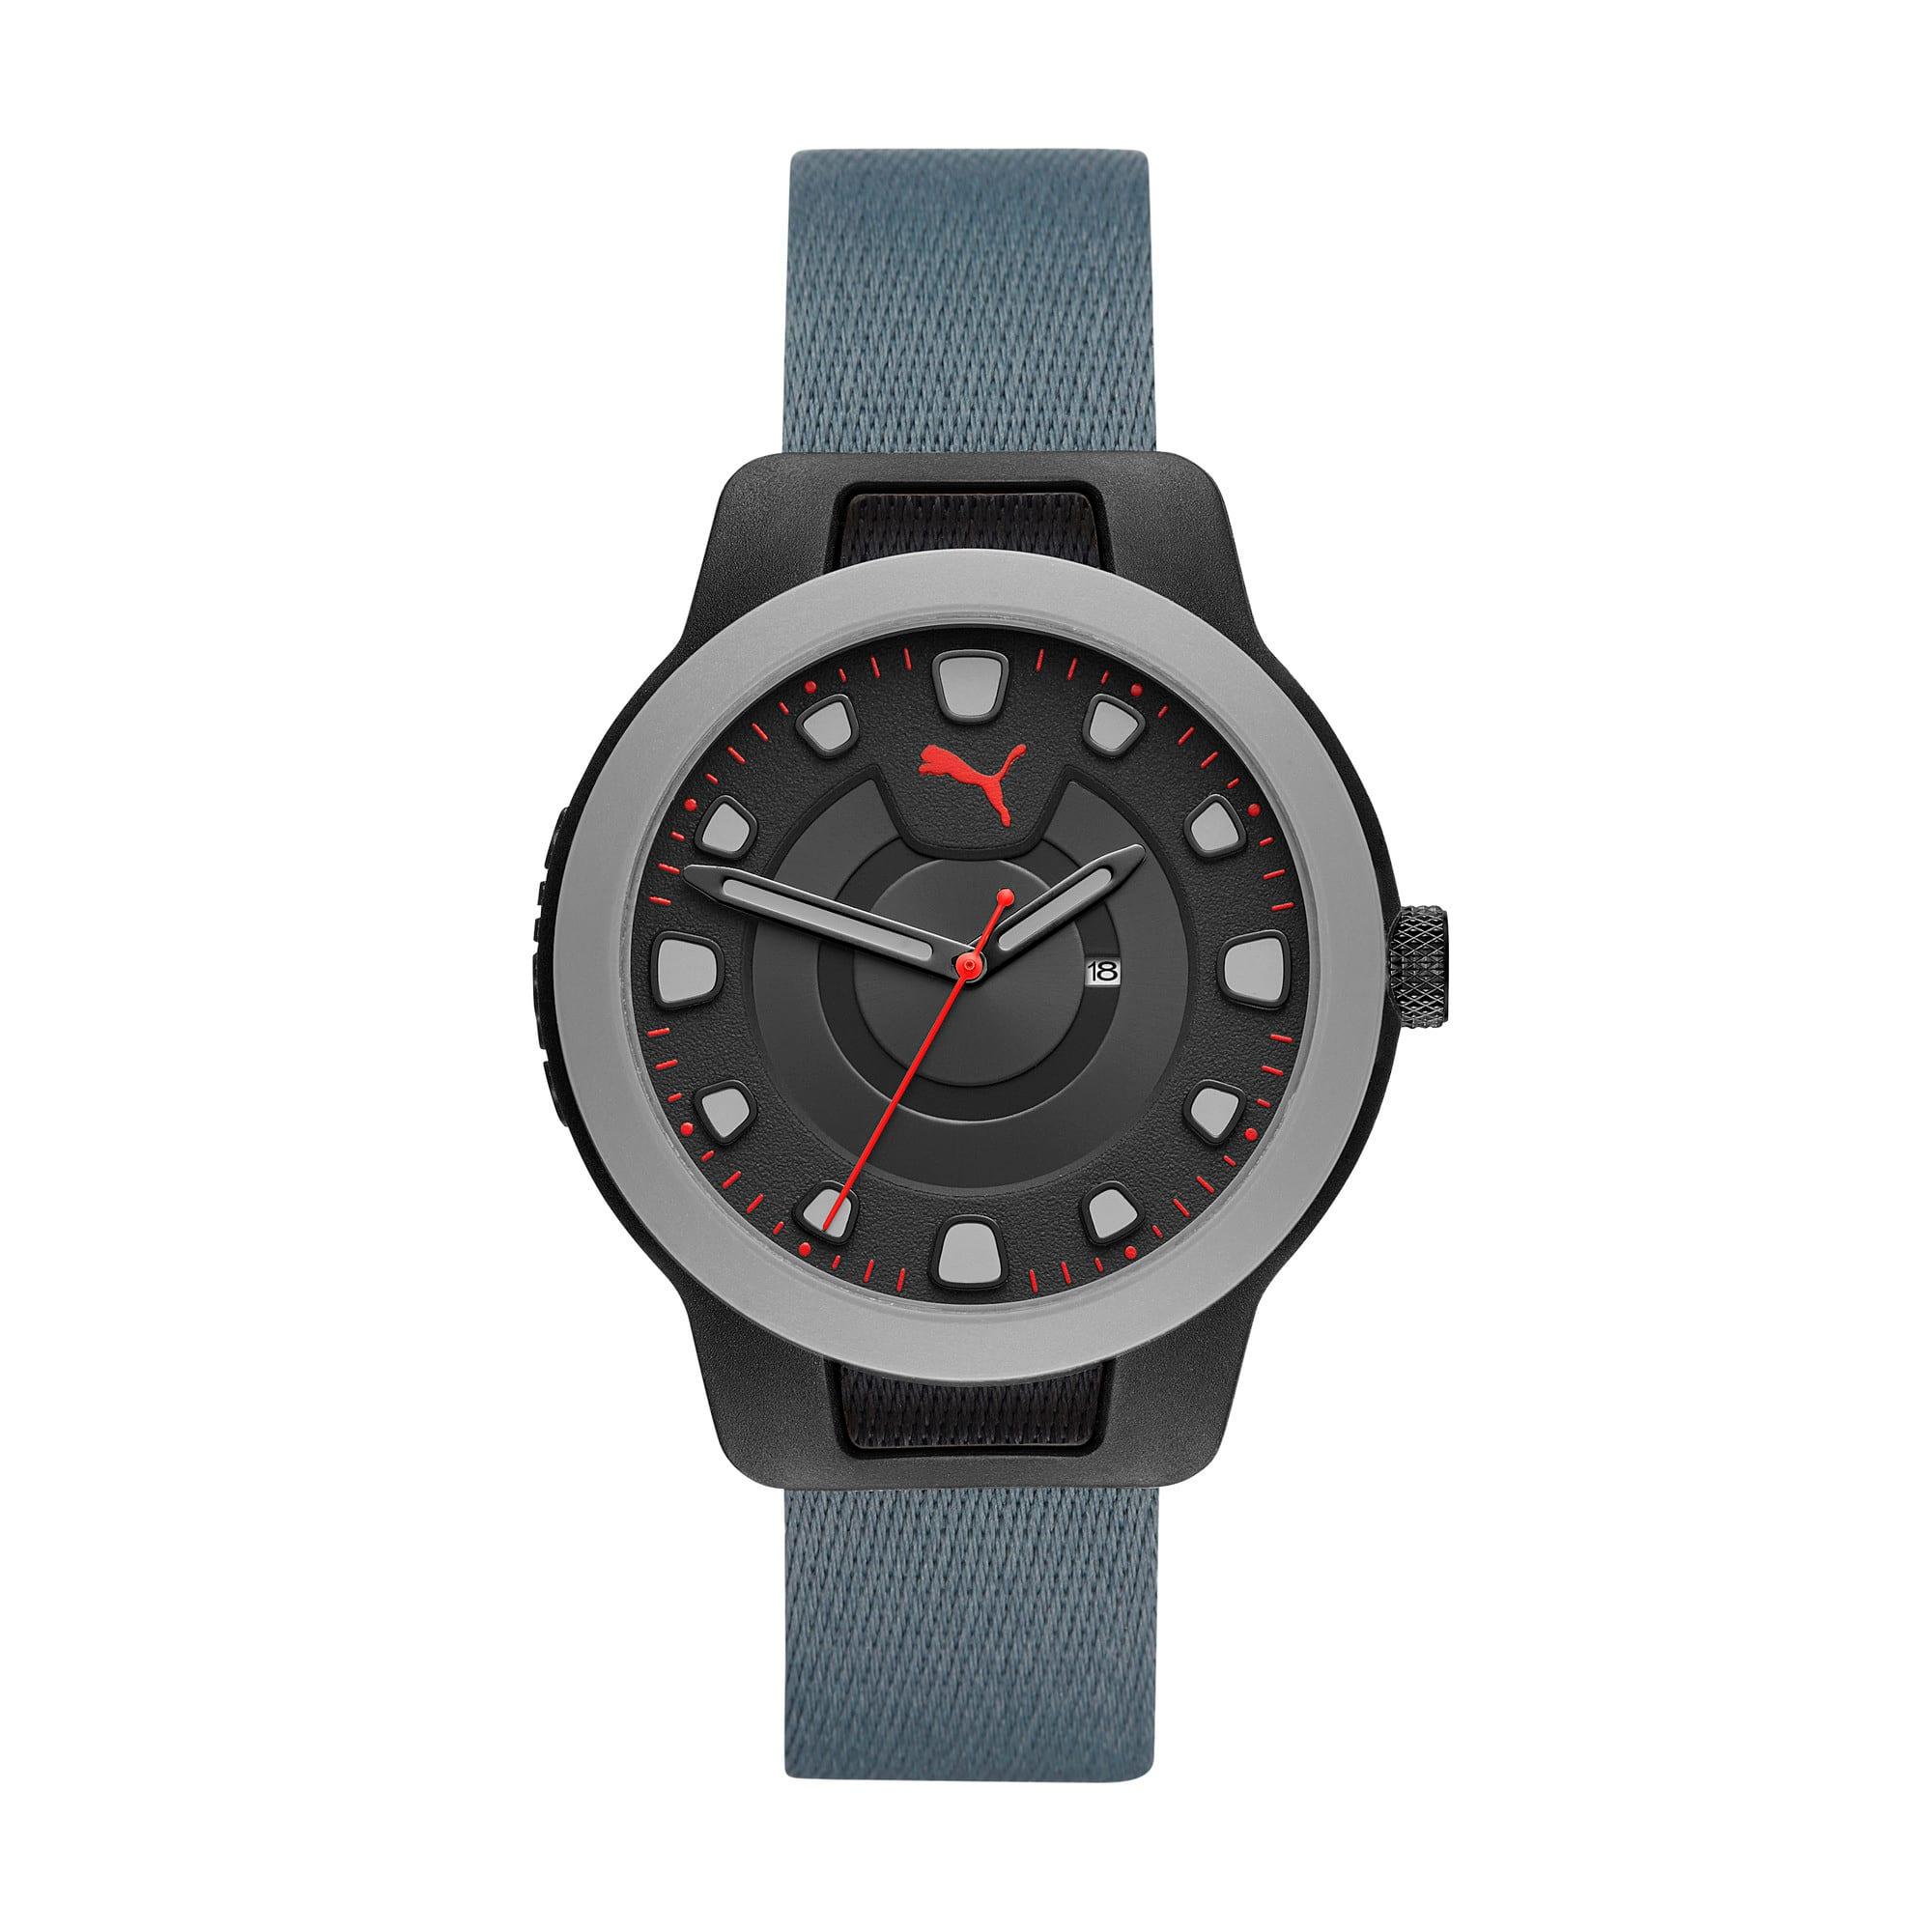 Thumbnail 1 of Reset v1 Reversible Watch, Blue/Red, medium